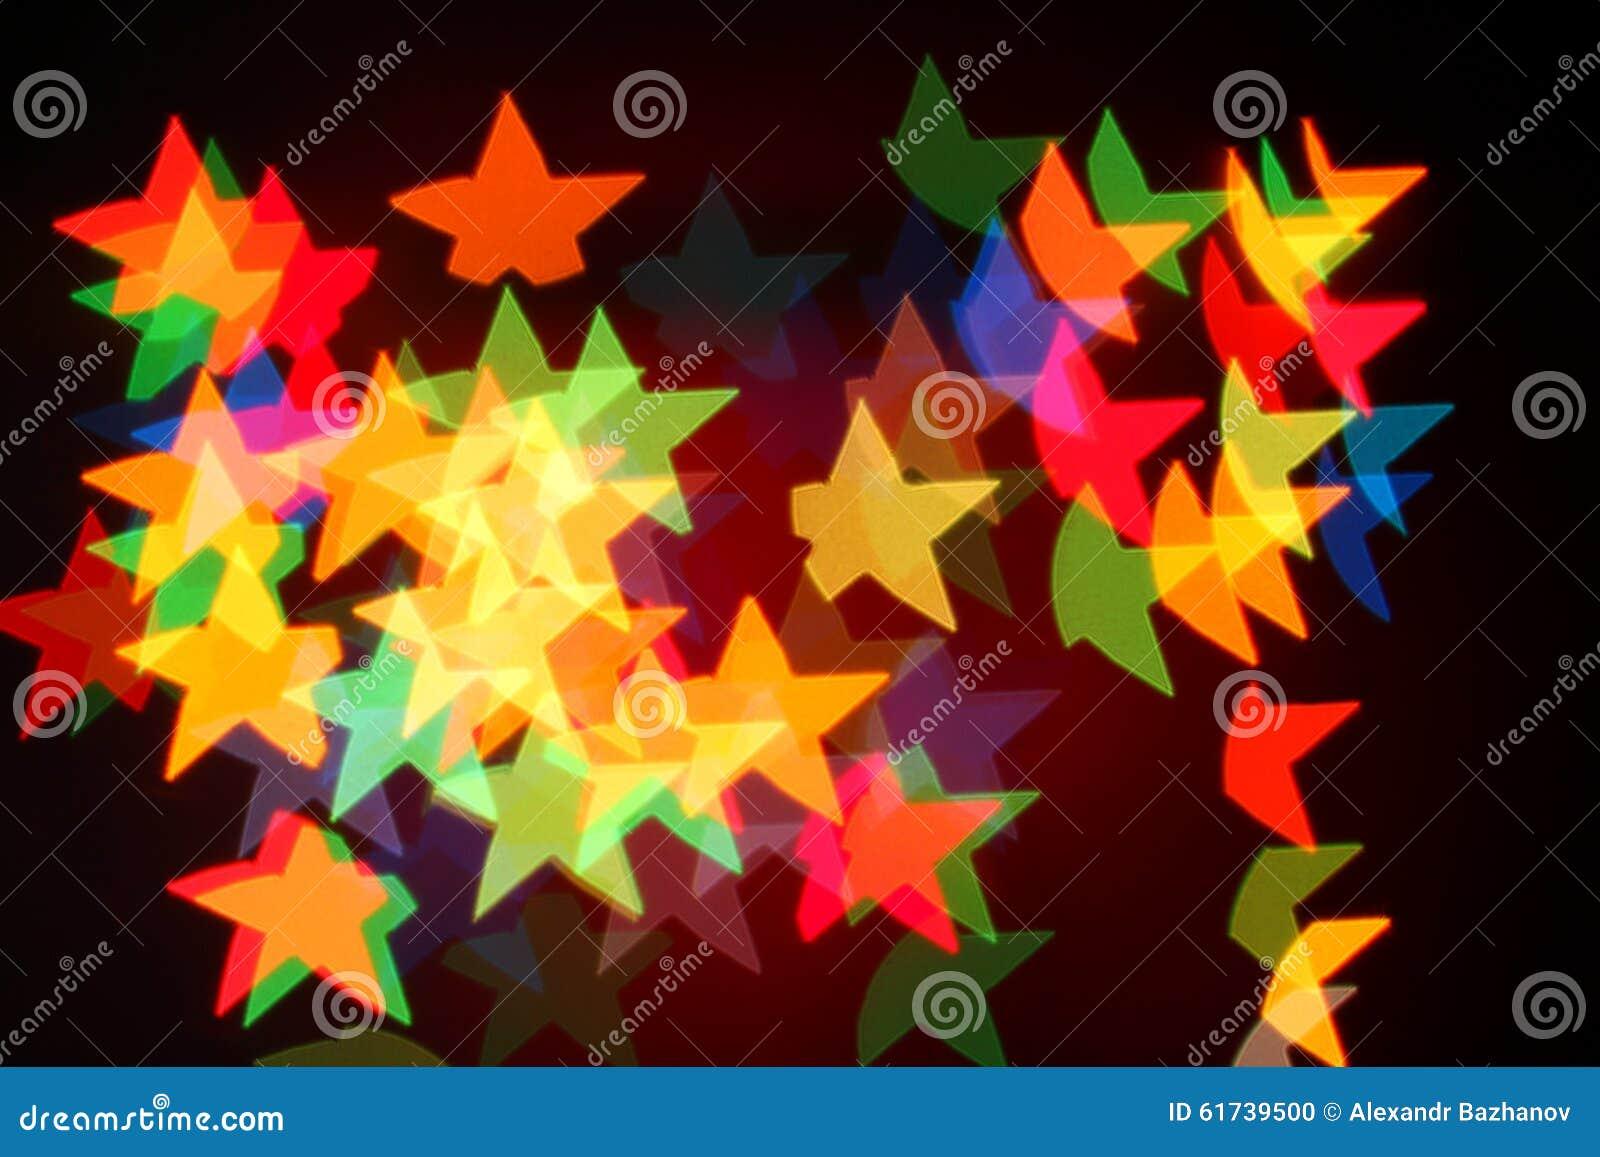 Christmas lights garland background garlands shape stars 61739500 jpg